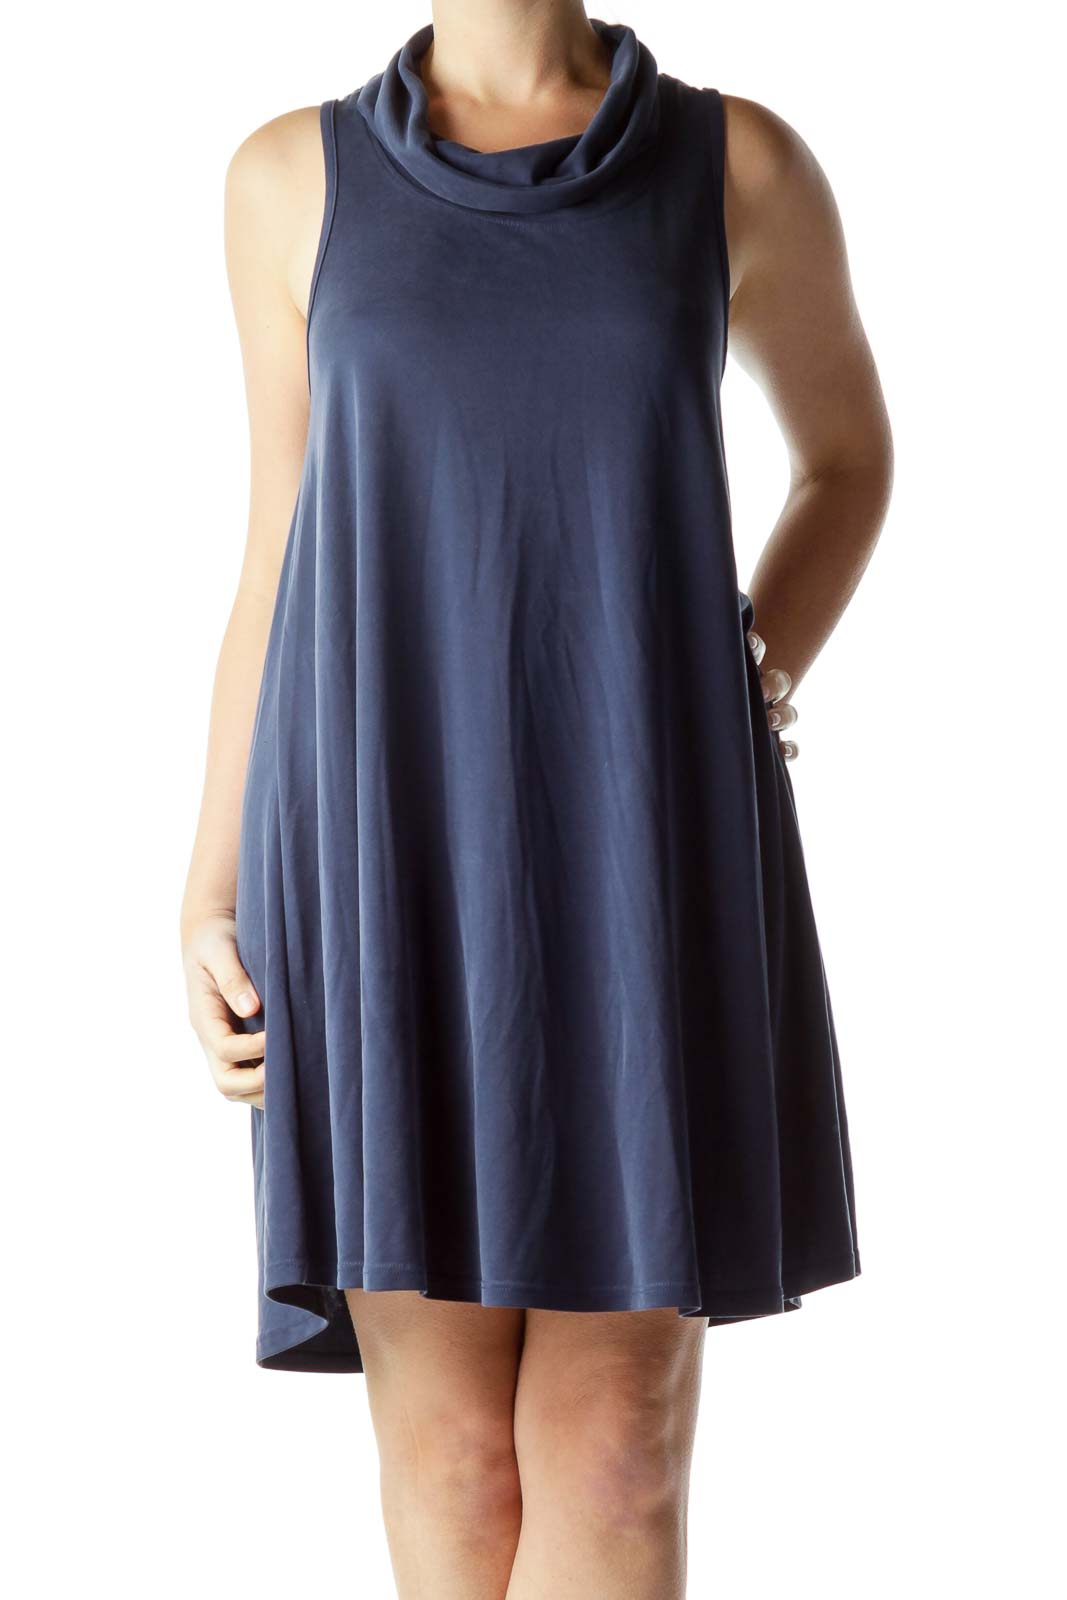 Blue Cowl Neck Shift Dress Front